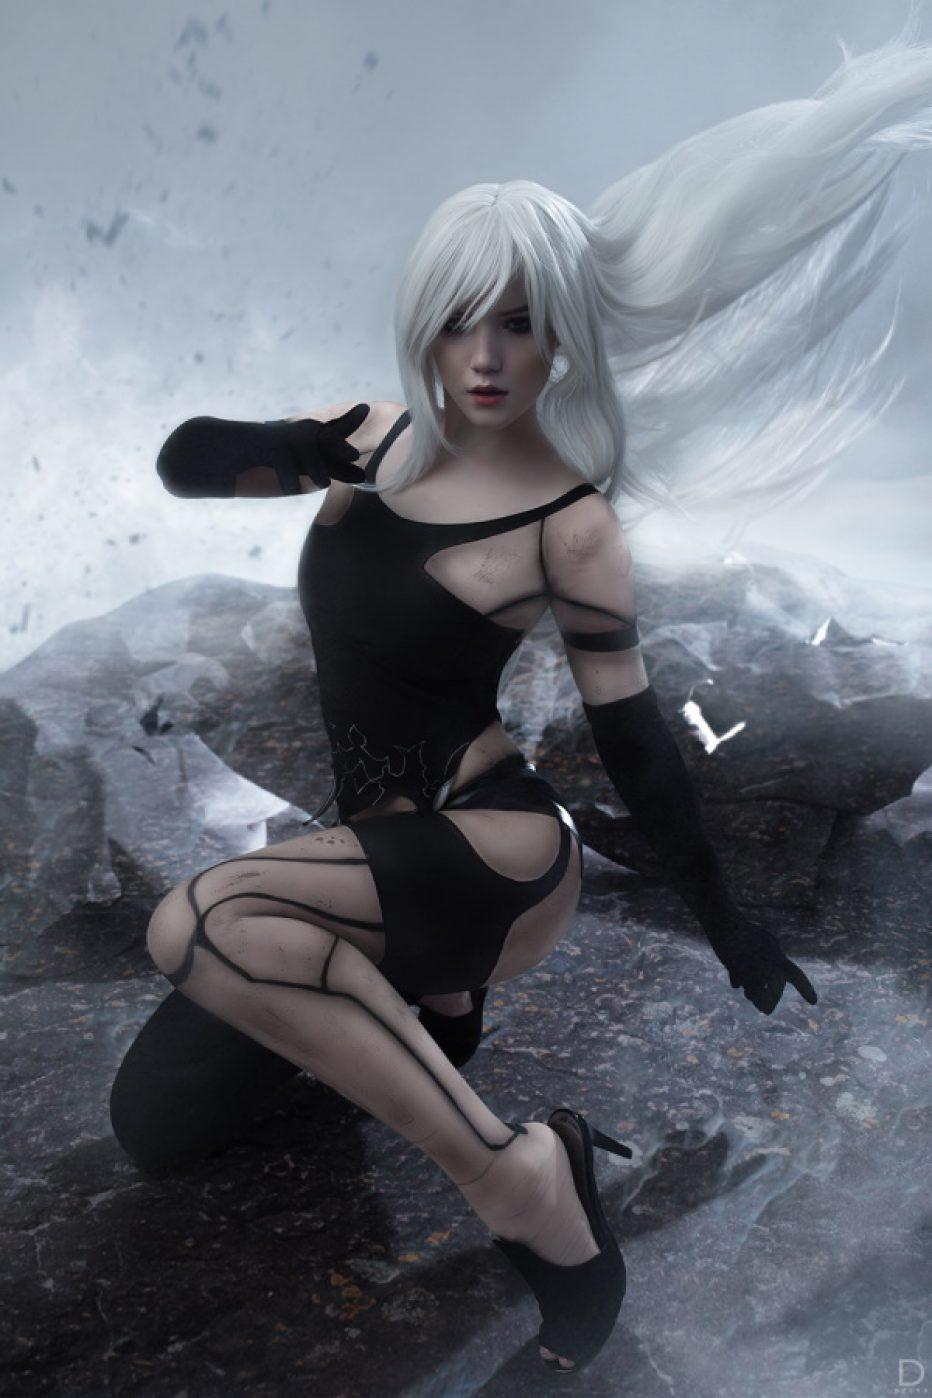 Nier-Automata-A2-Cosplay-Gamers-Heroes-3.jpg